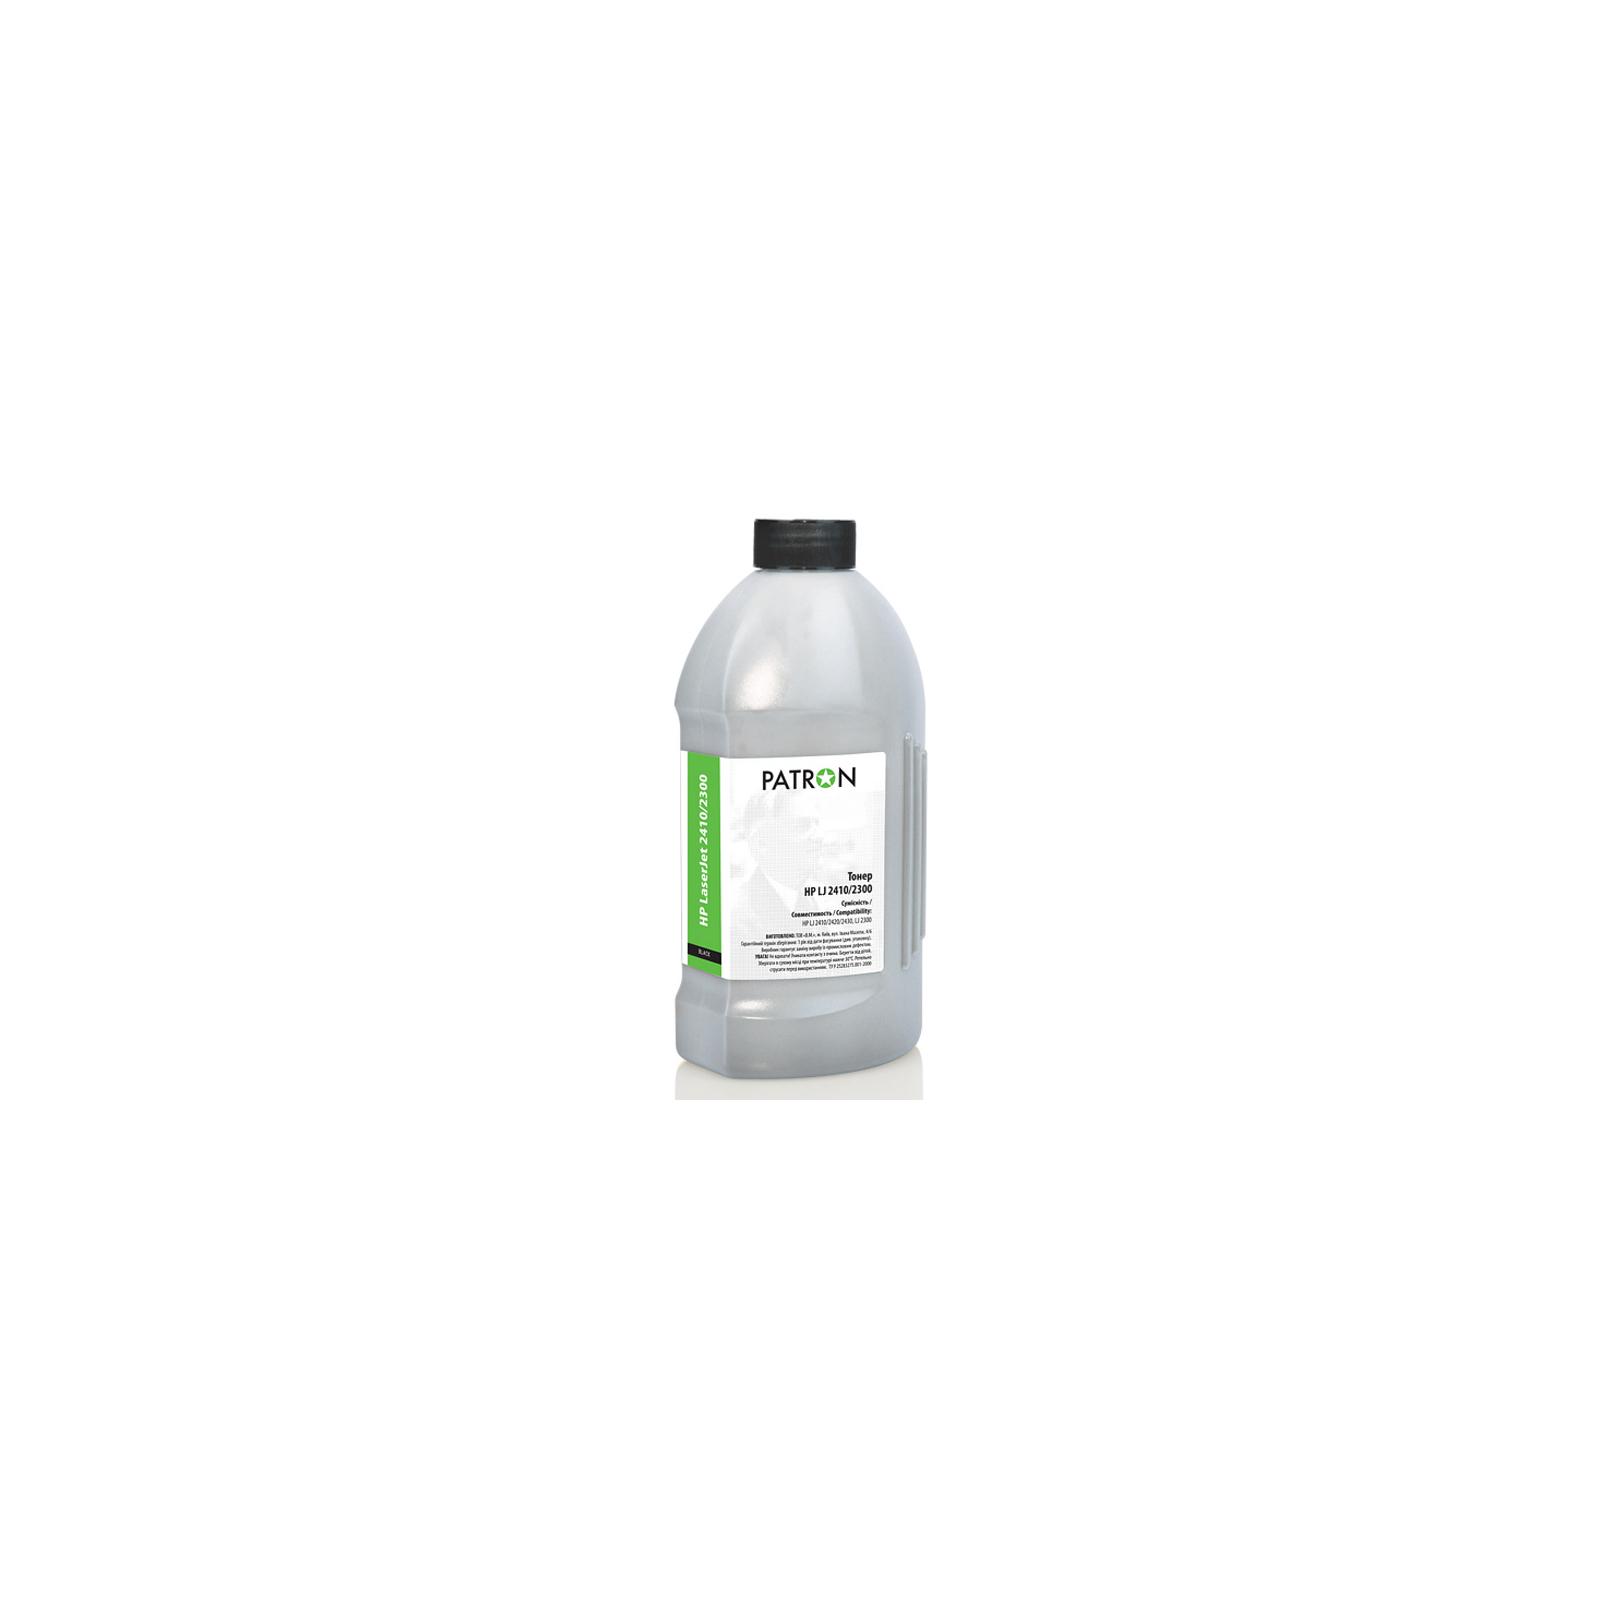 Тонер HP LJ2400/2410 (Q6511A/Q6511X) PATRON (PN-HLJ2410-300)